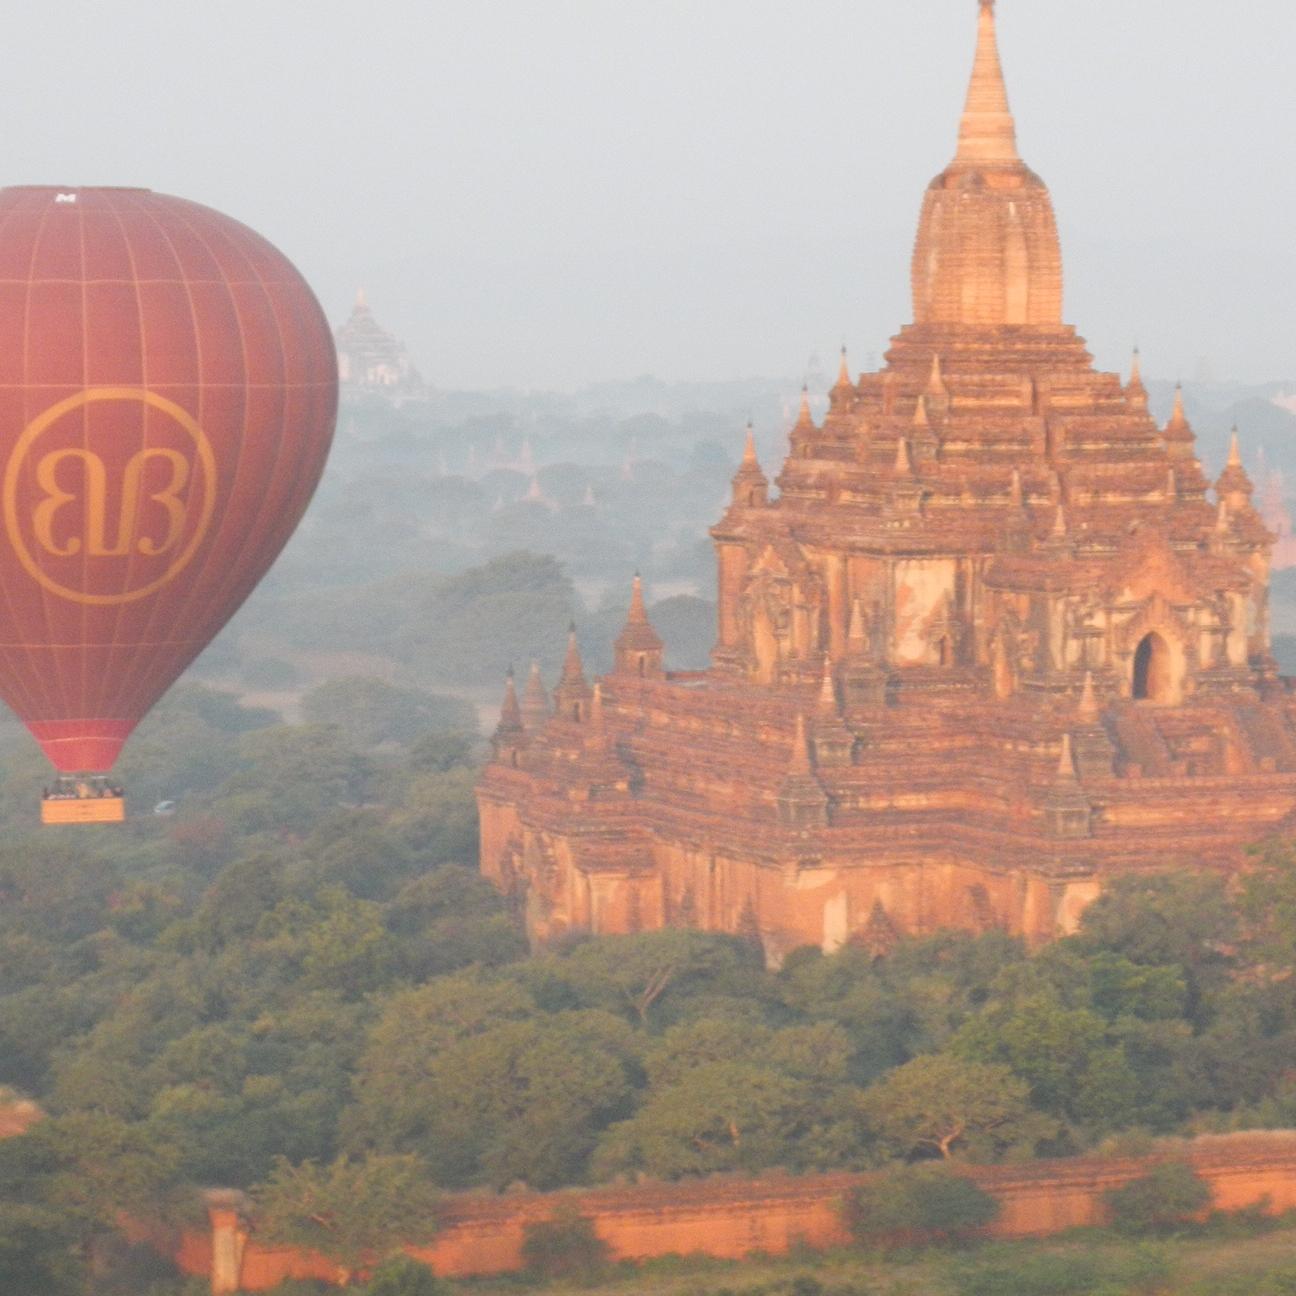 Balloons over Bagan, Myanmar (Burma) by The Doubtful Traveller